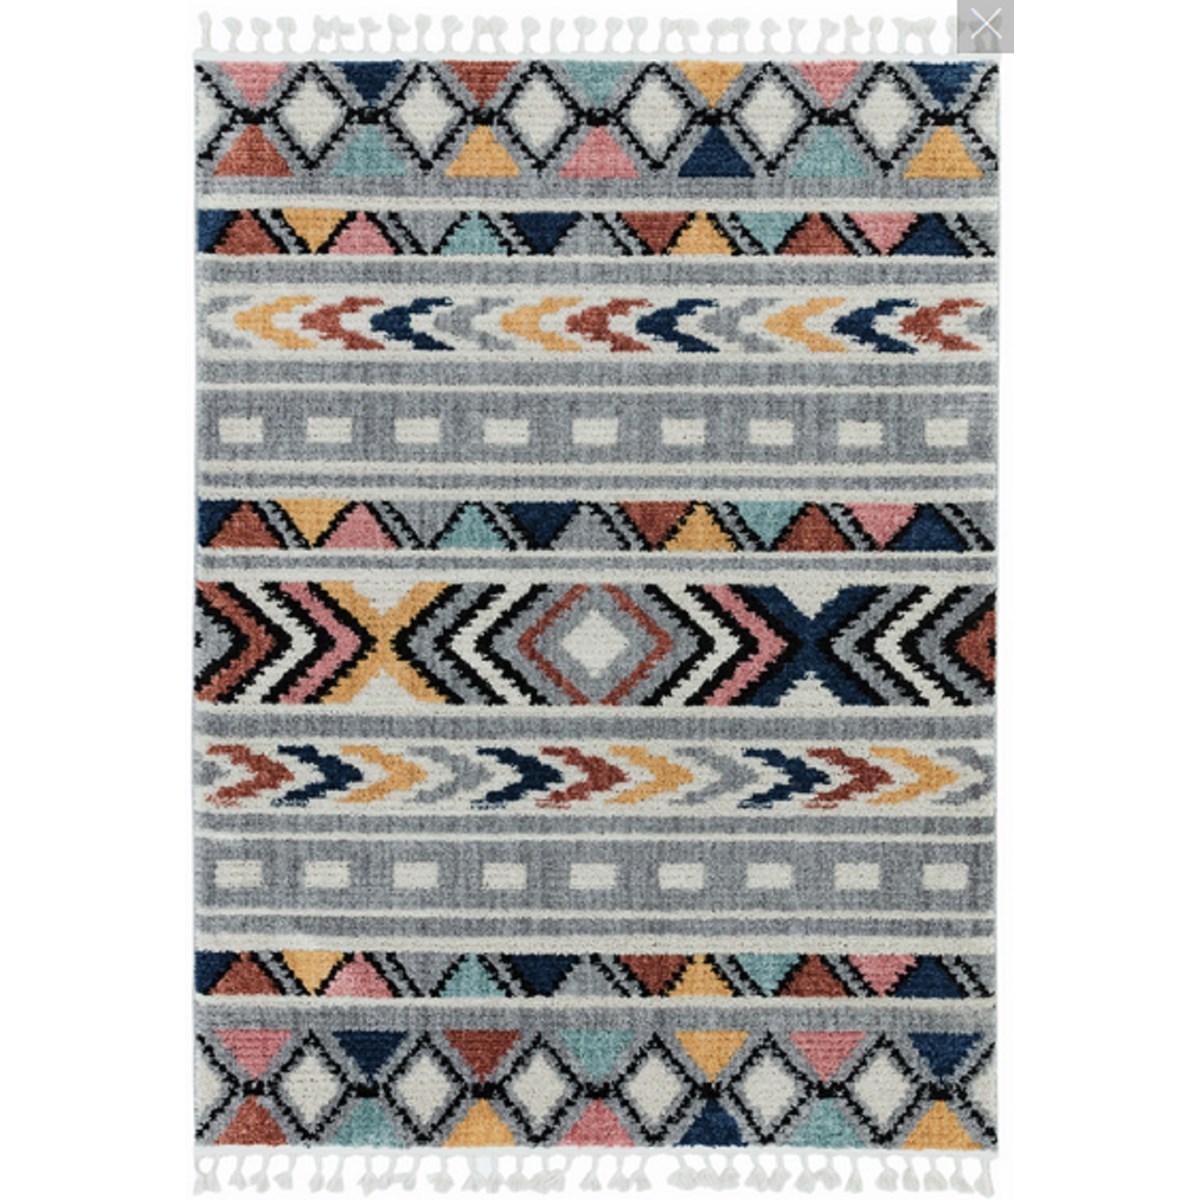 Tapis style berbère en Polyester Multicolore 120x170 cm